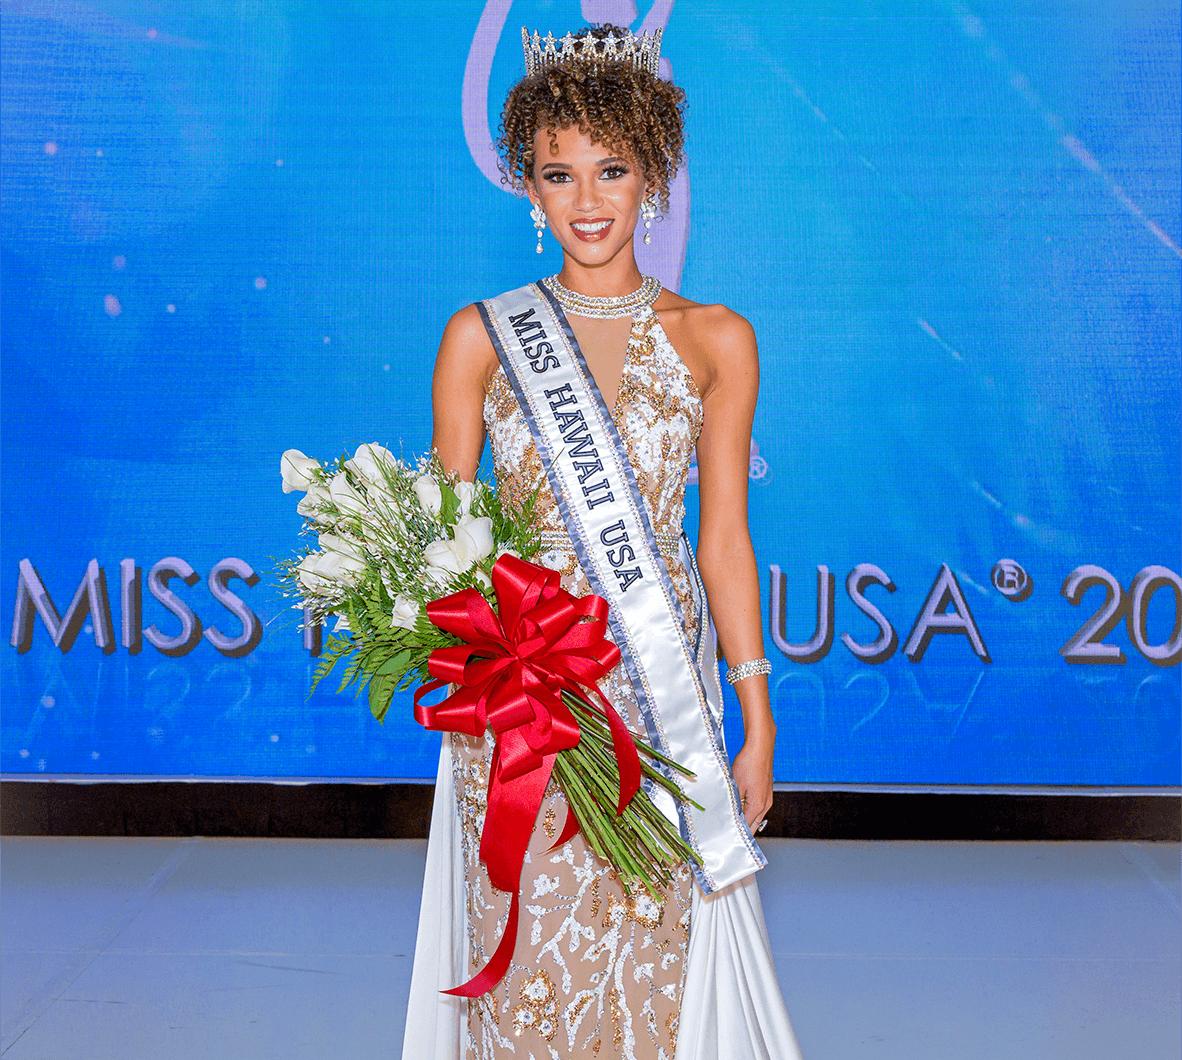 Samantha Neyland was crowned 2020 Miss Hawaii USA on November 10, 2019. Photo Credit: BK Photo